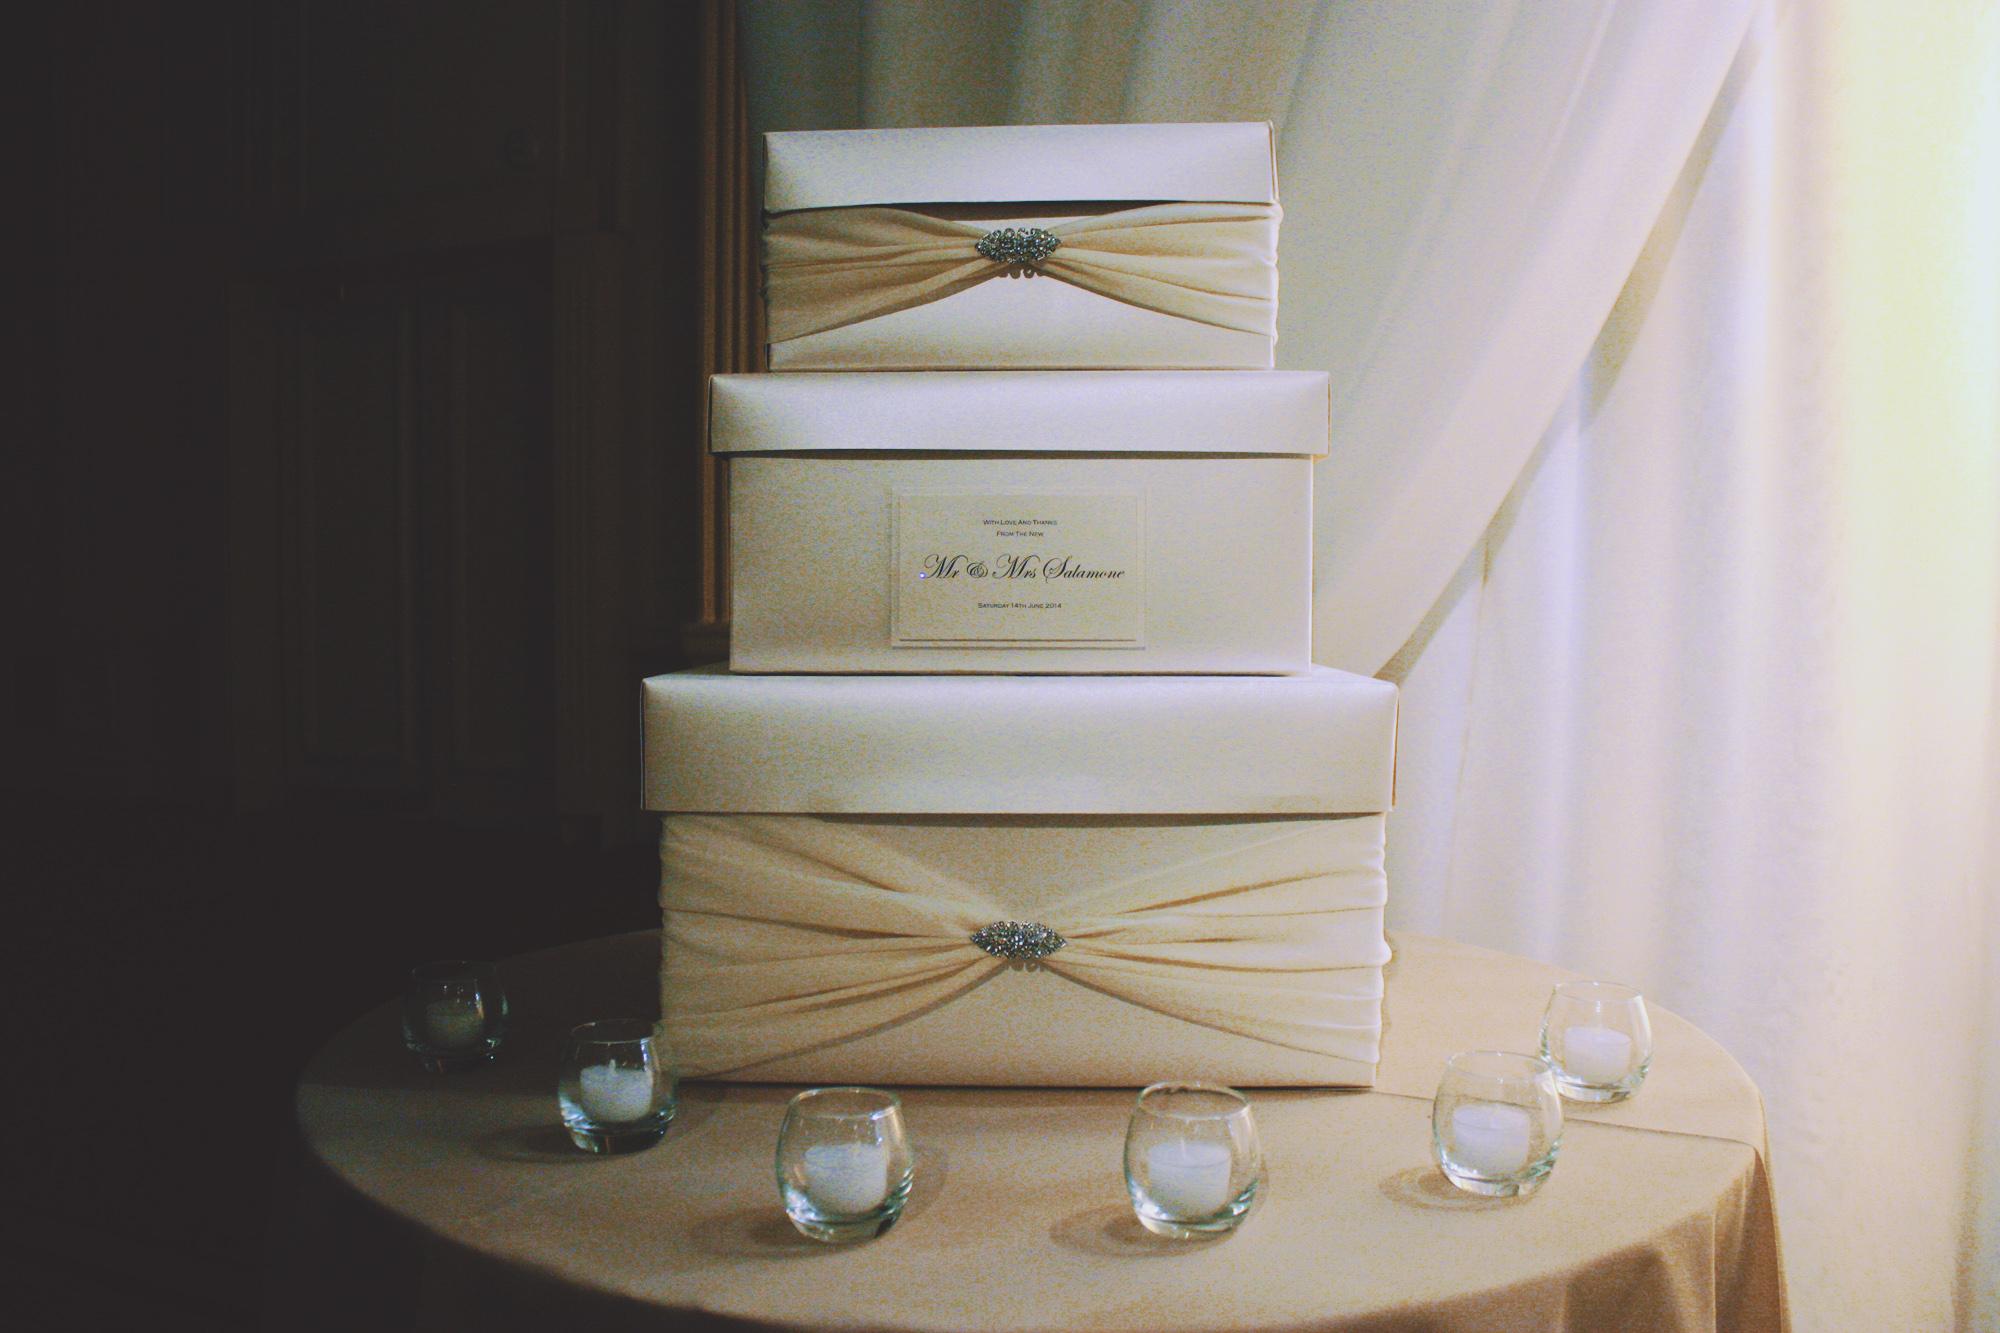 WEDDING_STATIONERY_BOXES_10.jpg